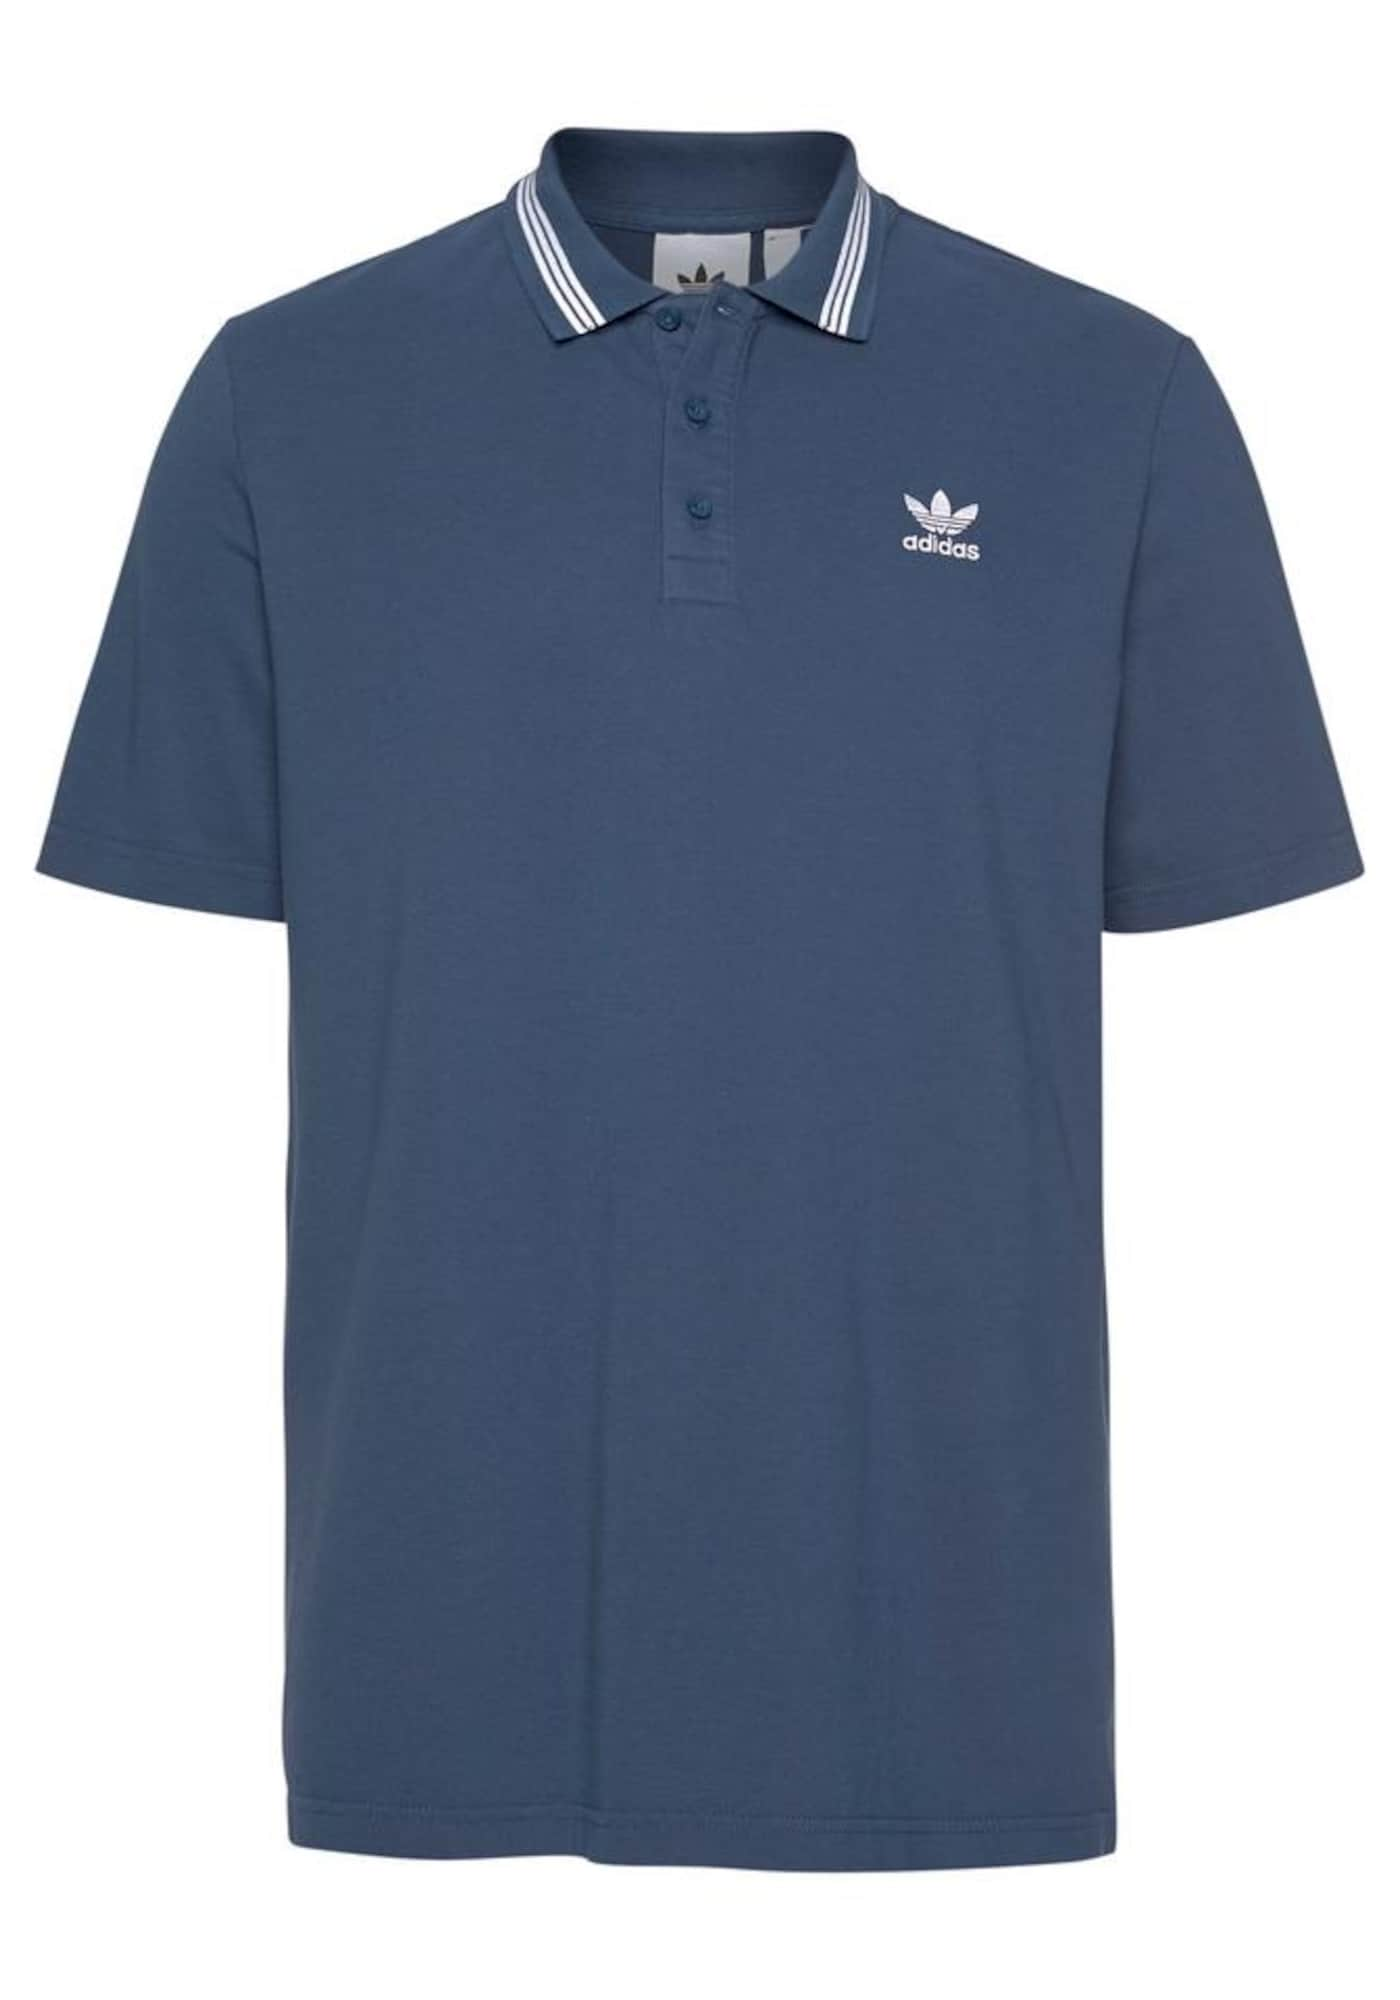 ADIDAS ORIGINALS Marškinėliai 'Pique' mėlyna